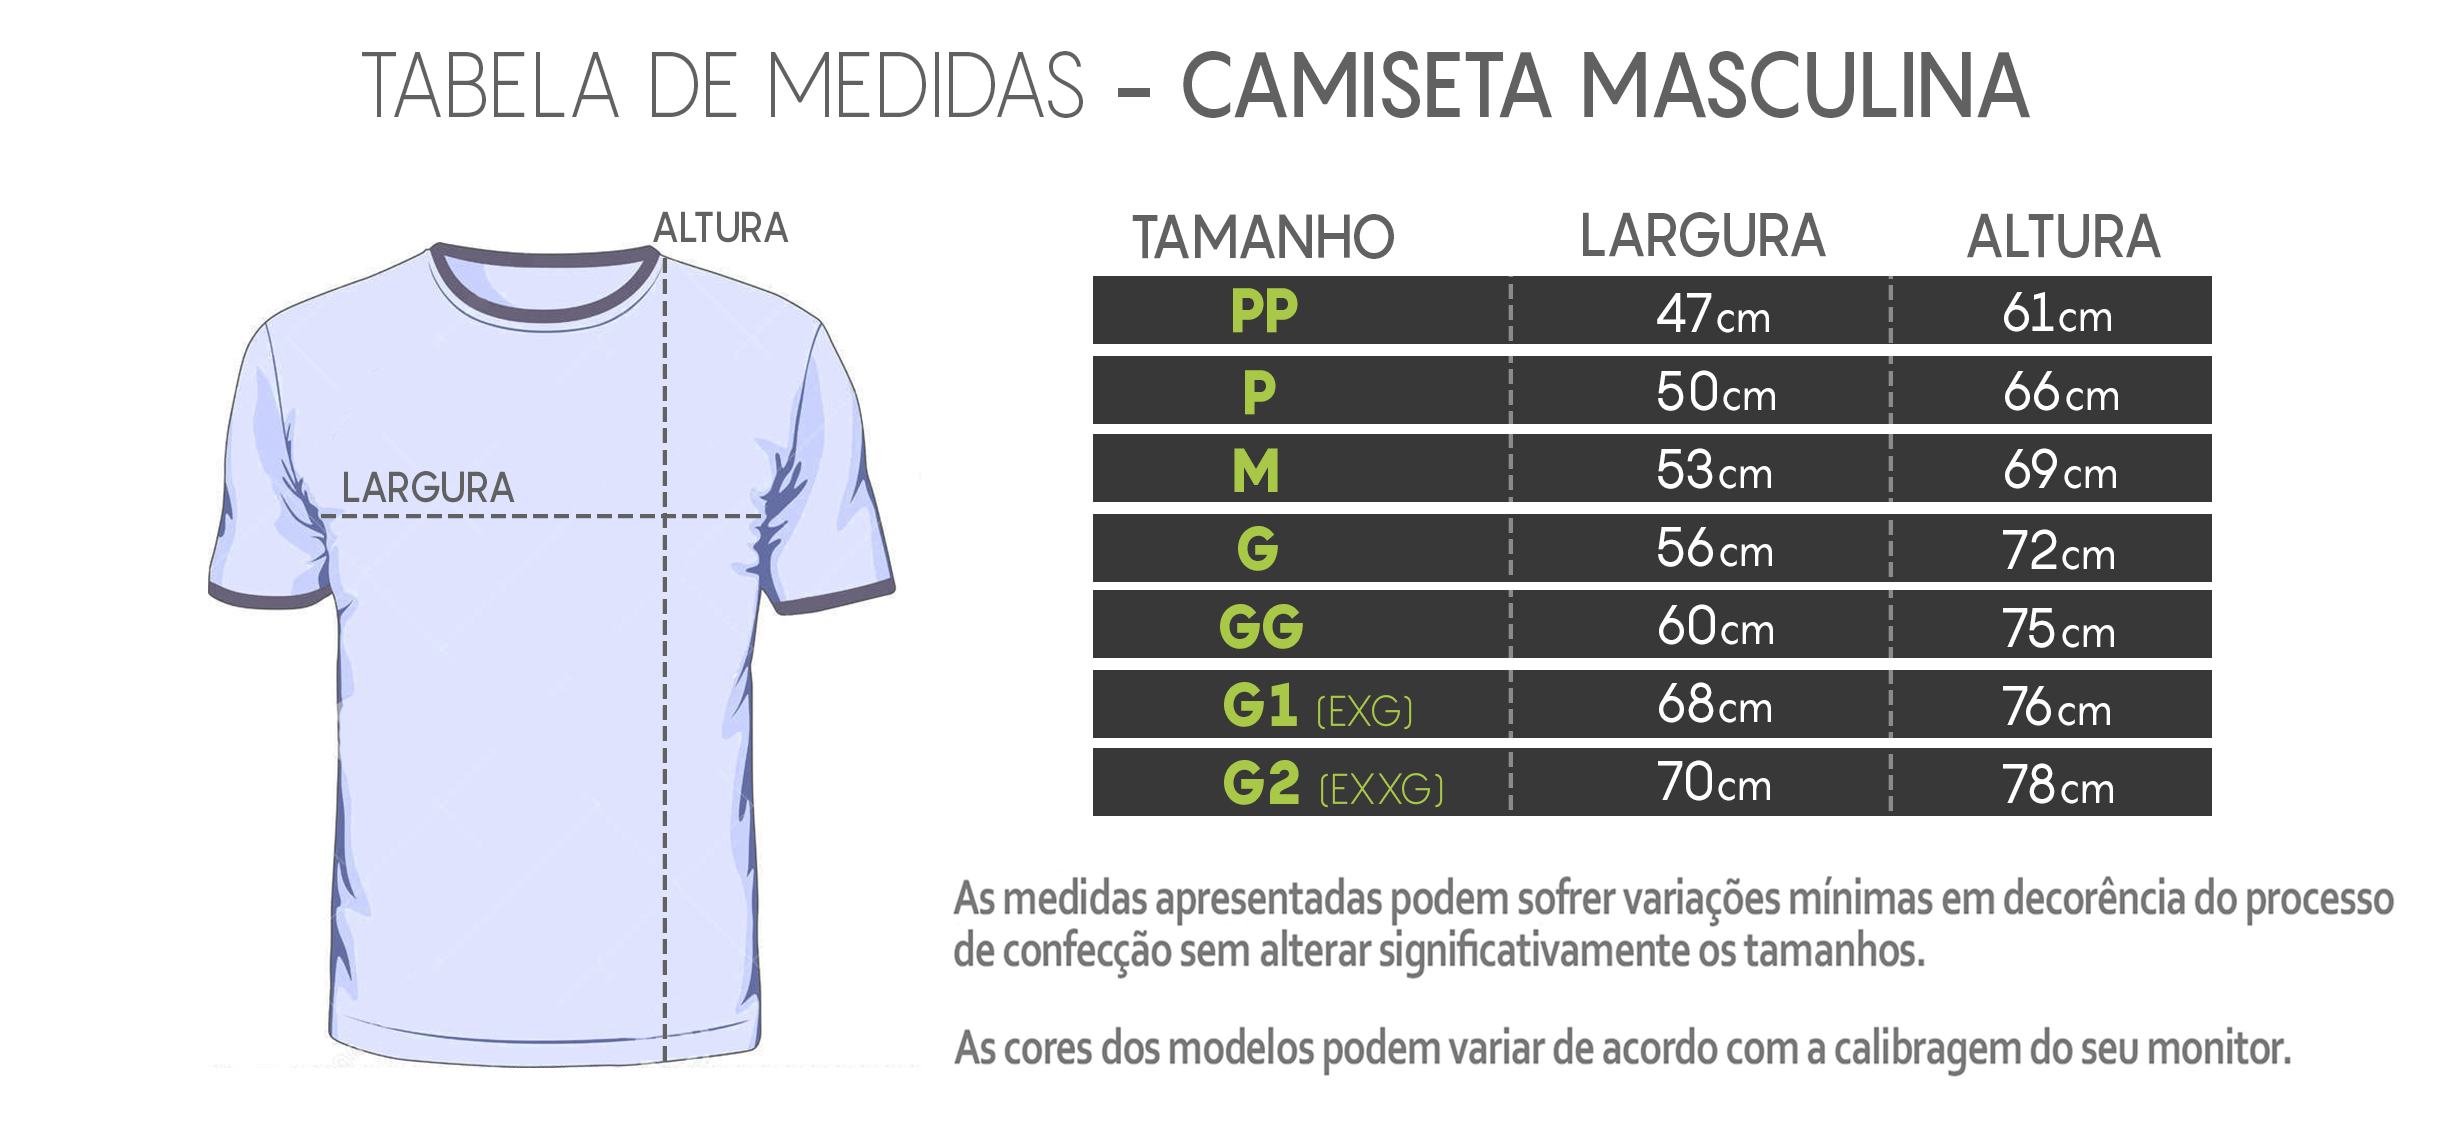 035080973 Camiseta Masculina Star Wars VIII 8 MD04 no Elo7